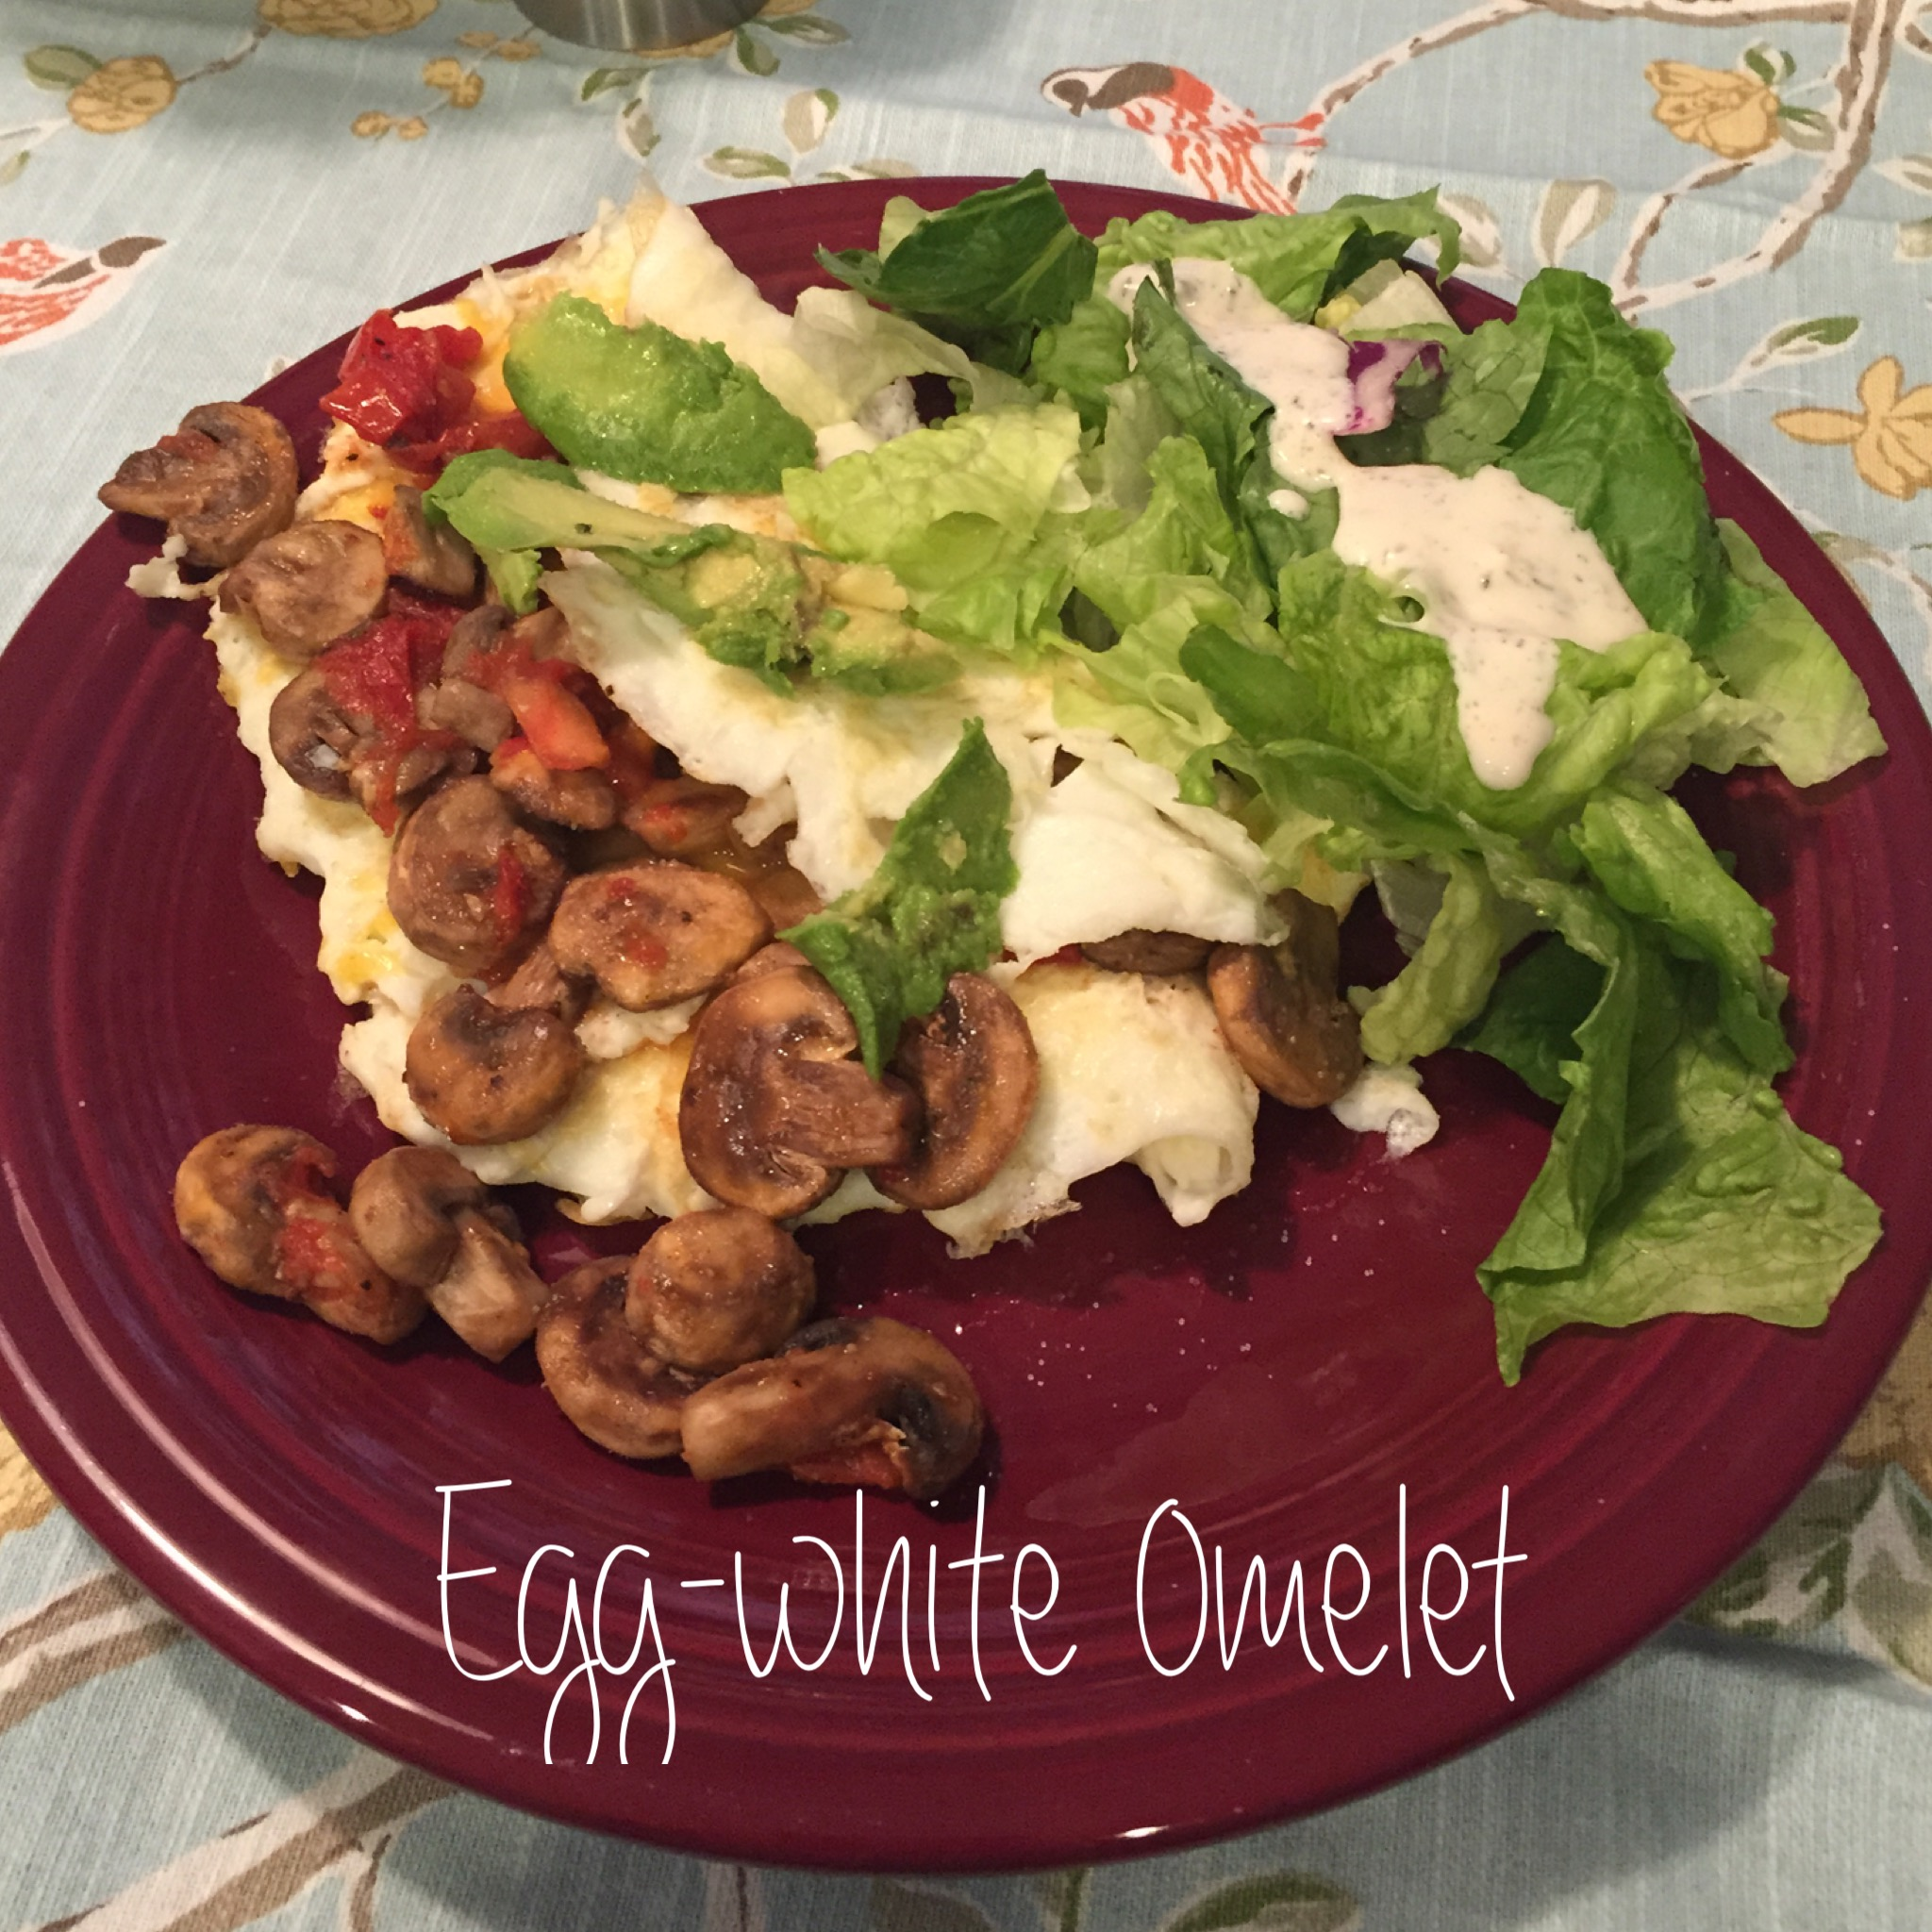 mushroom and tomato egg white omelet 5 oz egg whites lean protein 1 oz ...